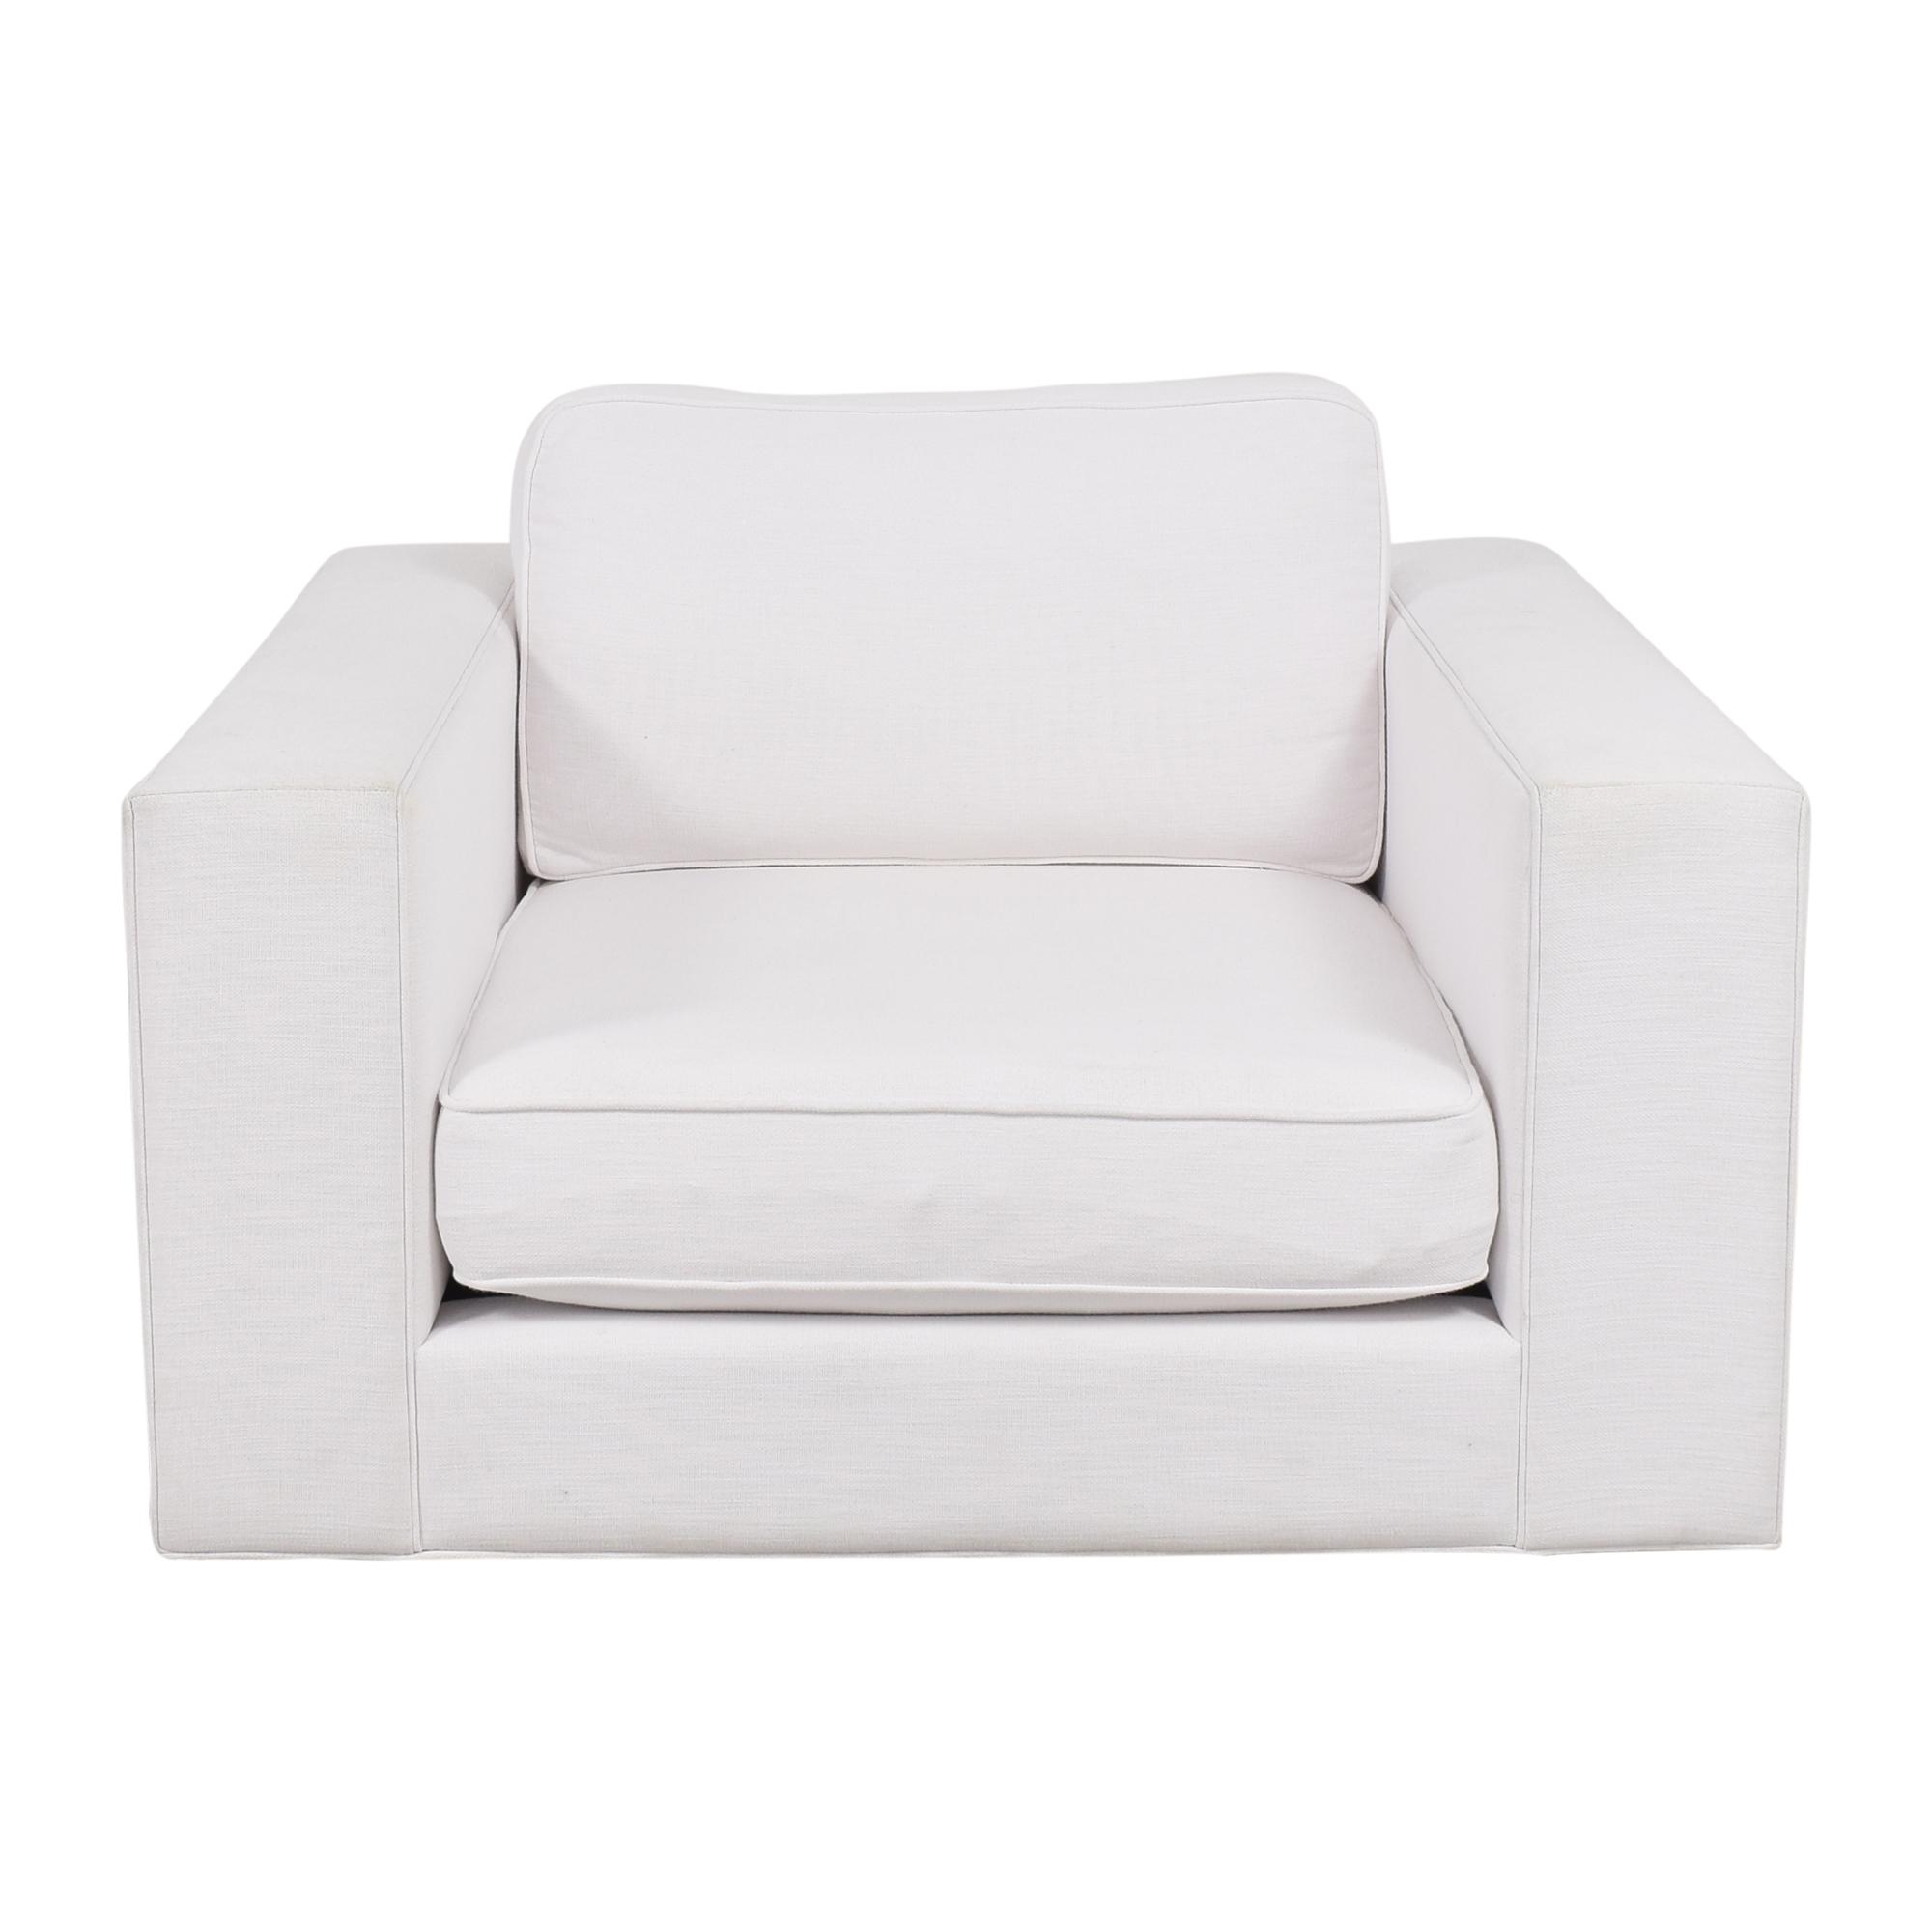 Restoration Hardware Maddox Arm Chair / Chairs